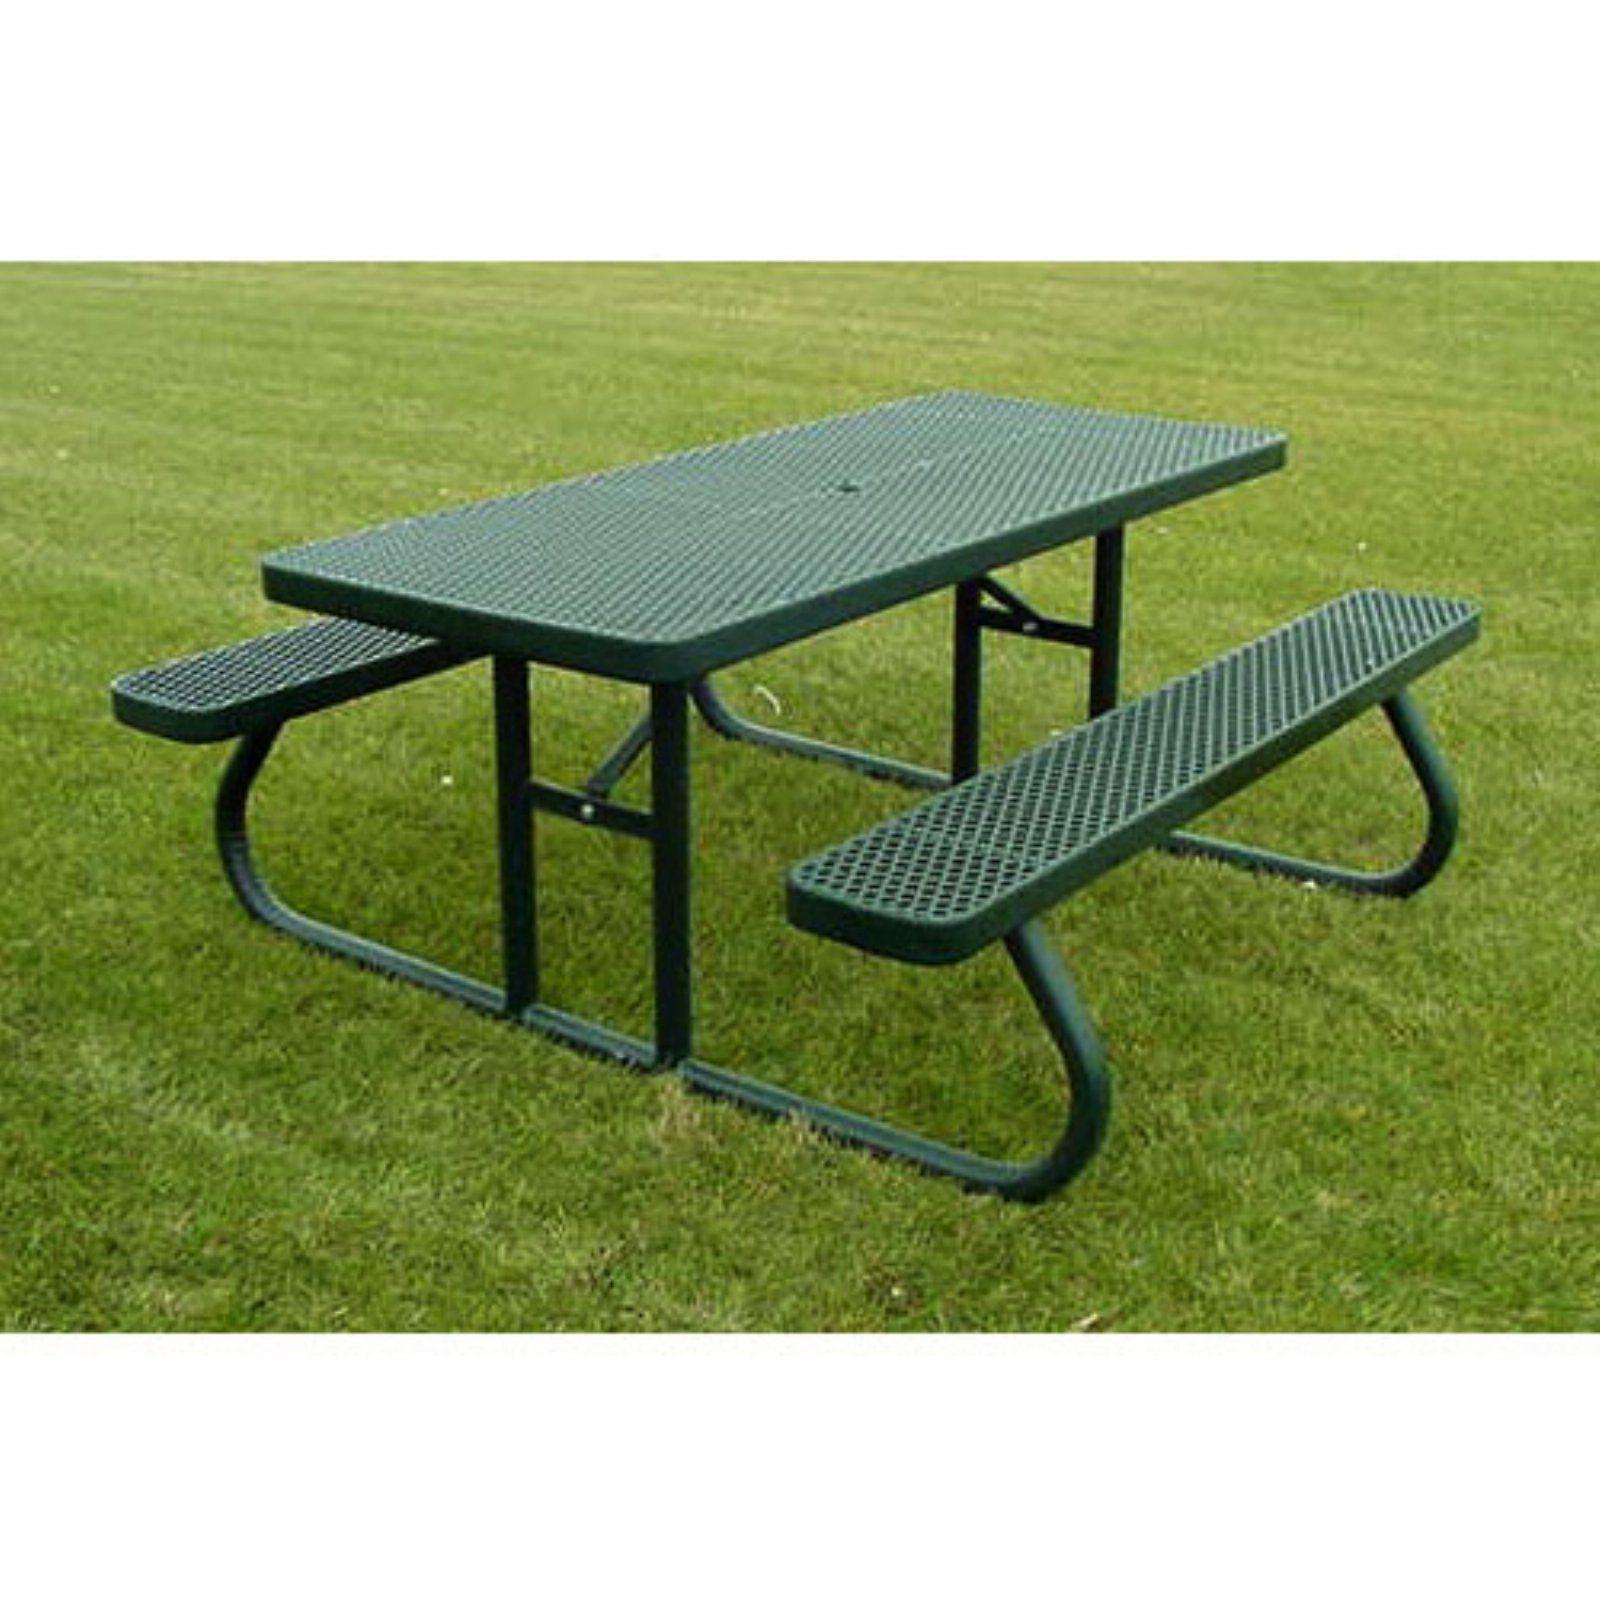 Astounding Outdoor Premier Polysteel Chamption 6 Ft Rectangle Machost Co Dining Chair Design Ideas Machostcouk